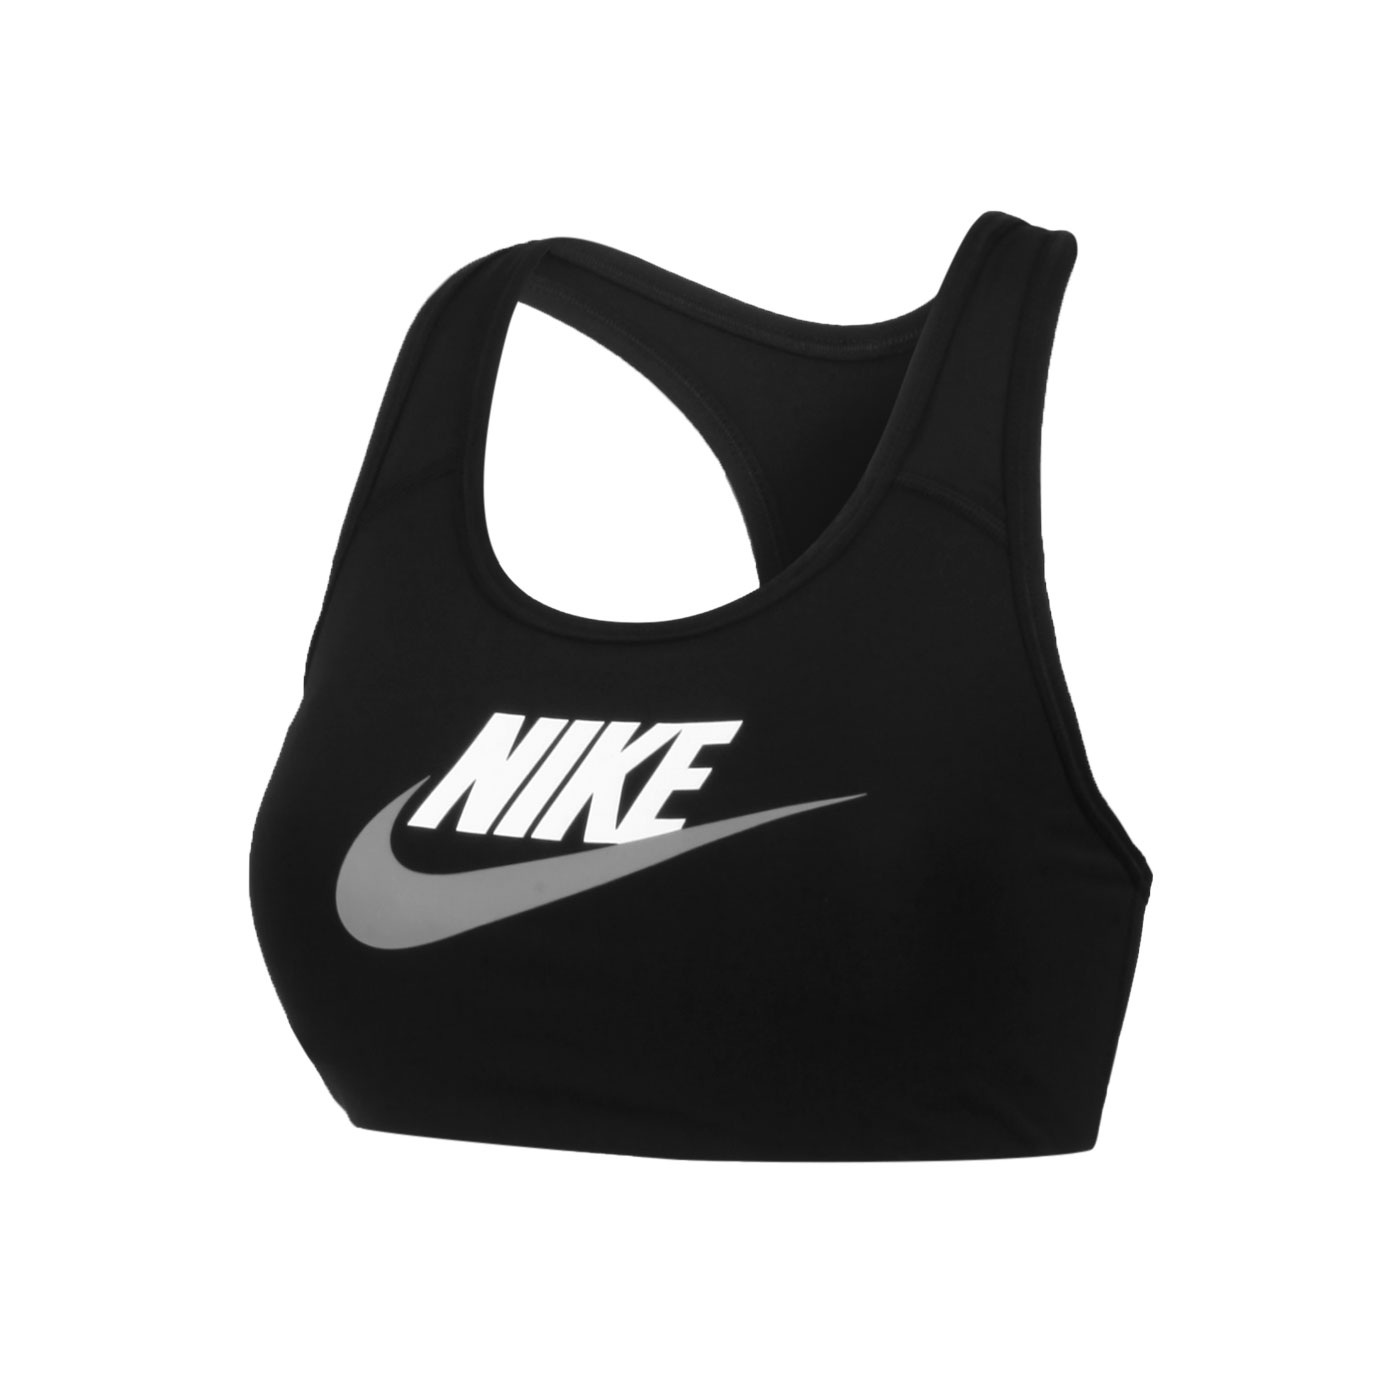 NIKE 女款運動內衣 DM0580-010 - 黑白